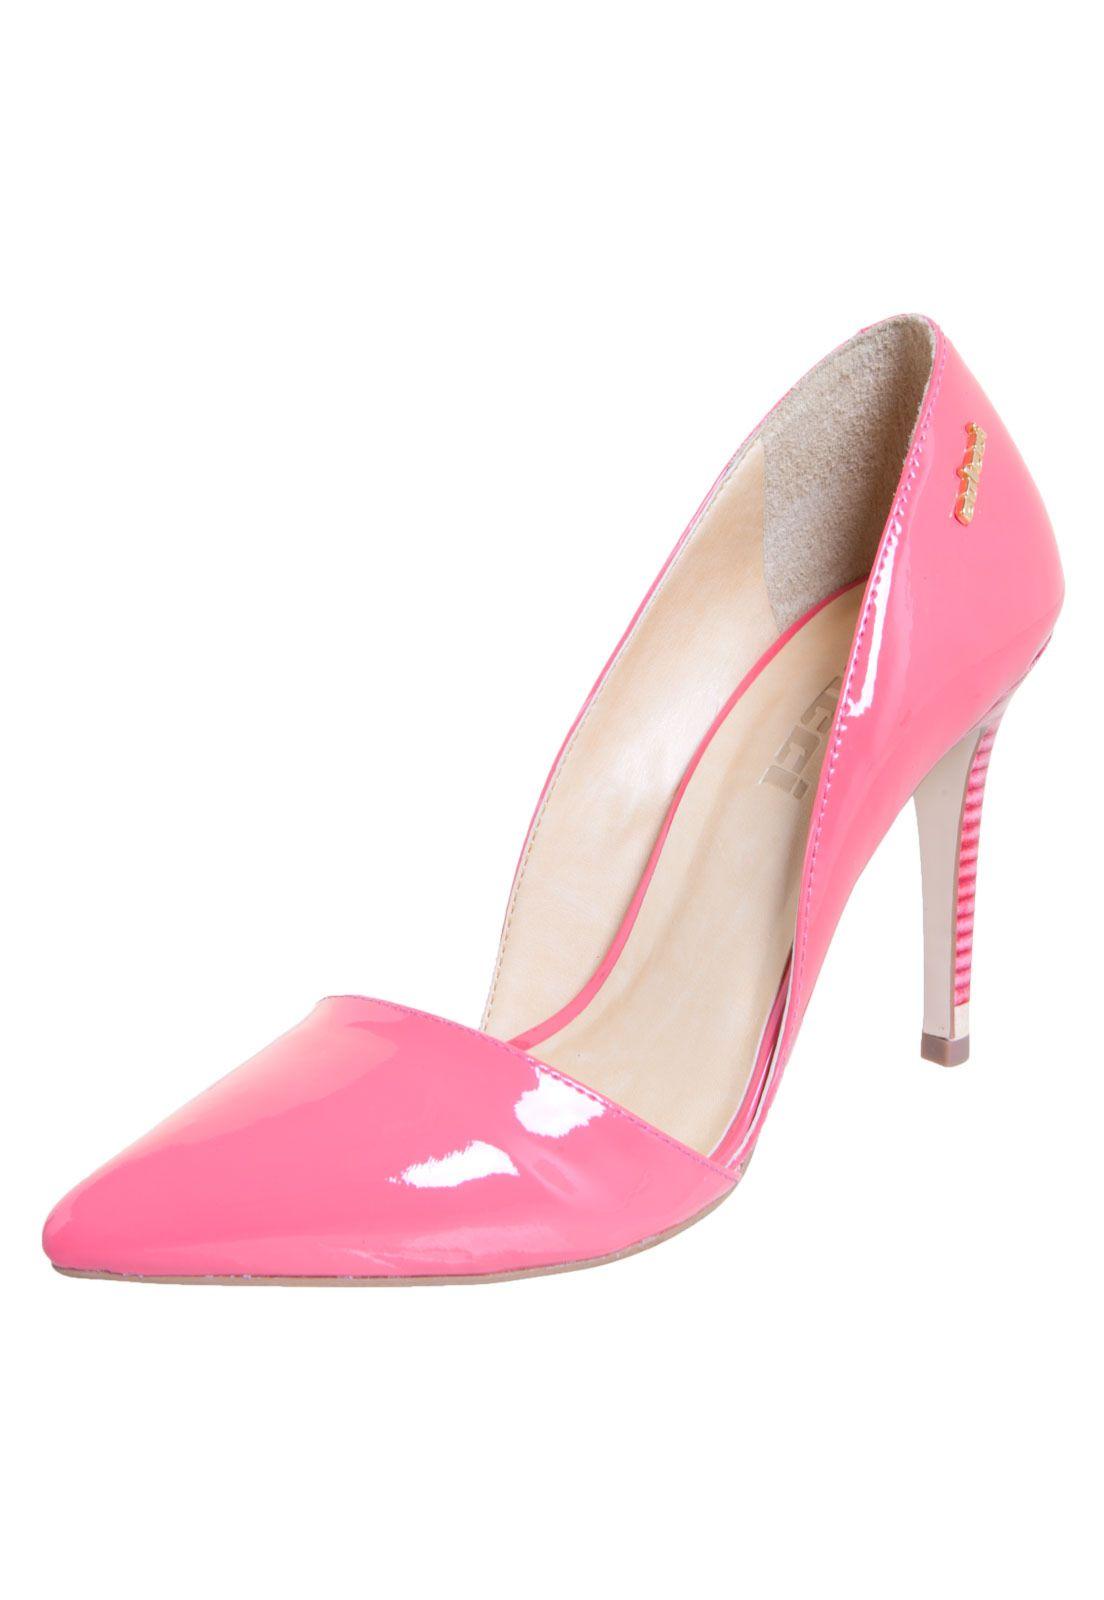 b1088afca Scarpin Colcci Sapato Rosa   Zapatos y Carteras   Sapatos, Sapatos ...